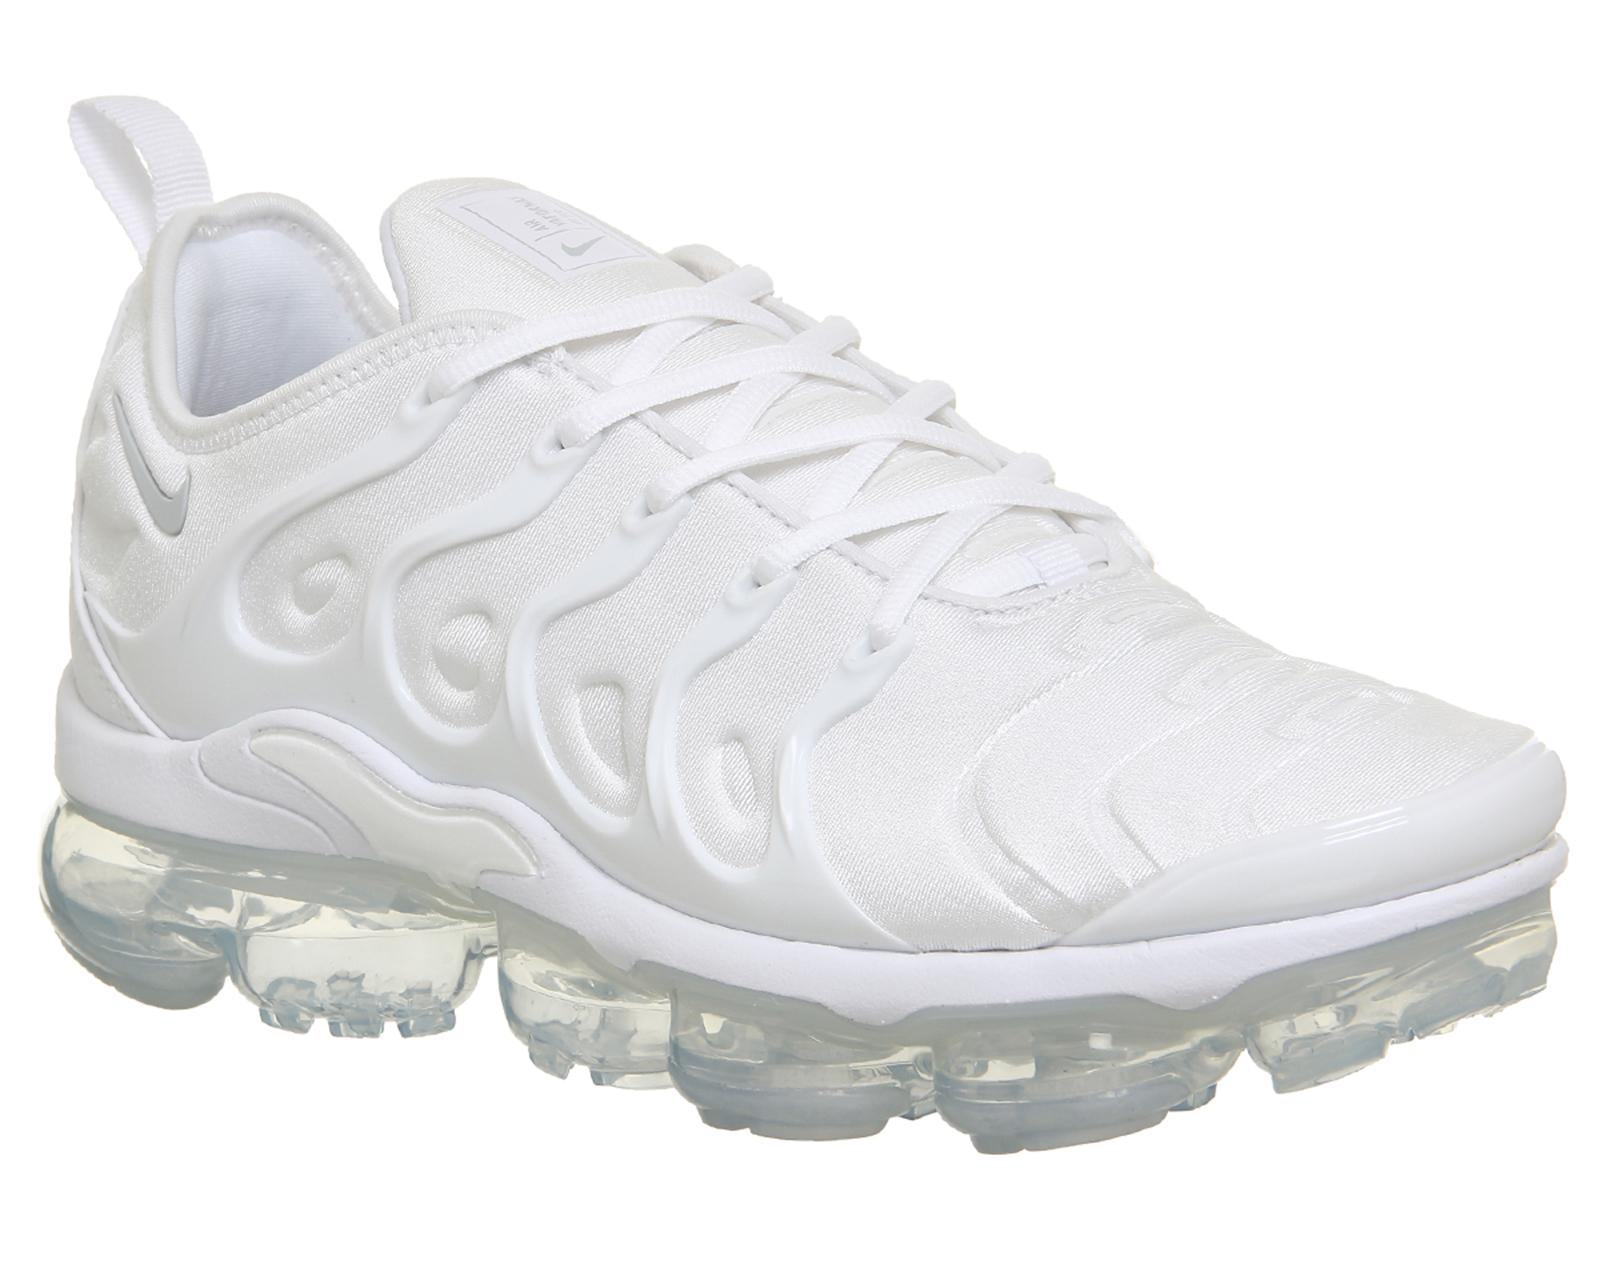 719cb941910 Lyst - Nike Air Vapormax Plus in White